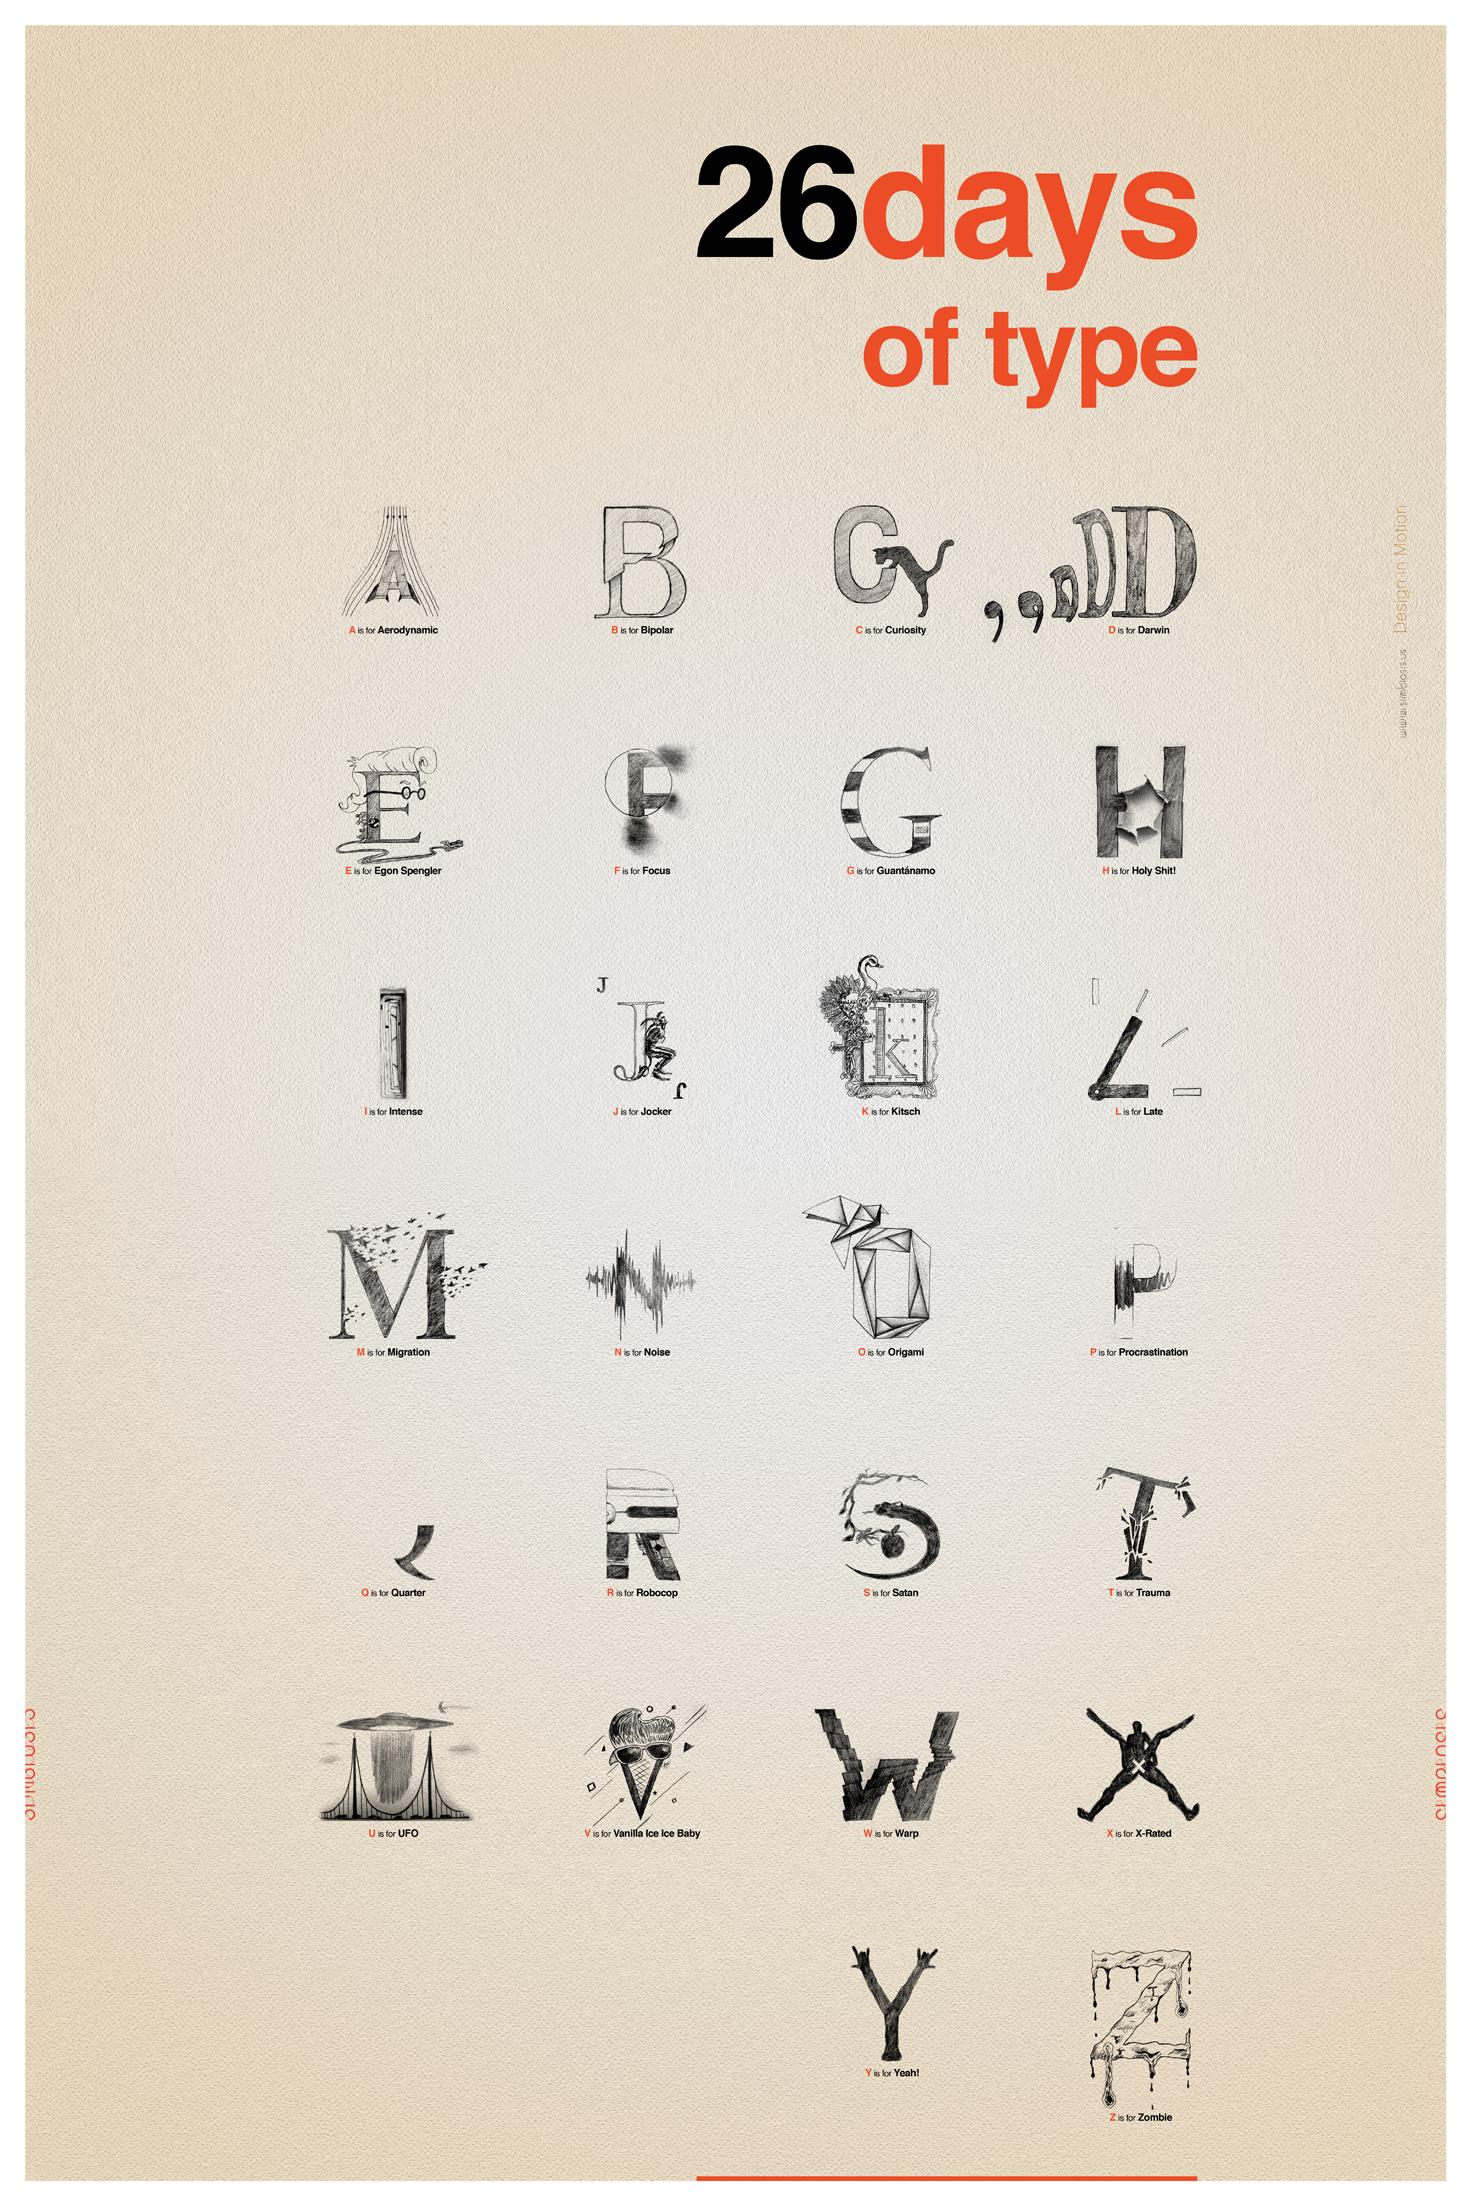 26 Days of type